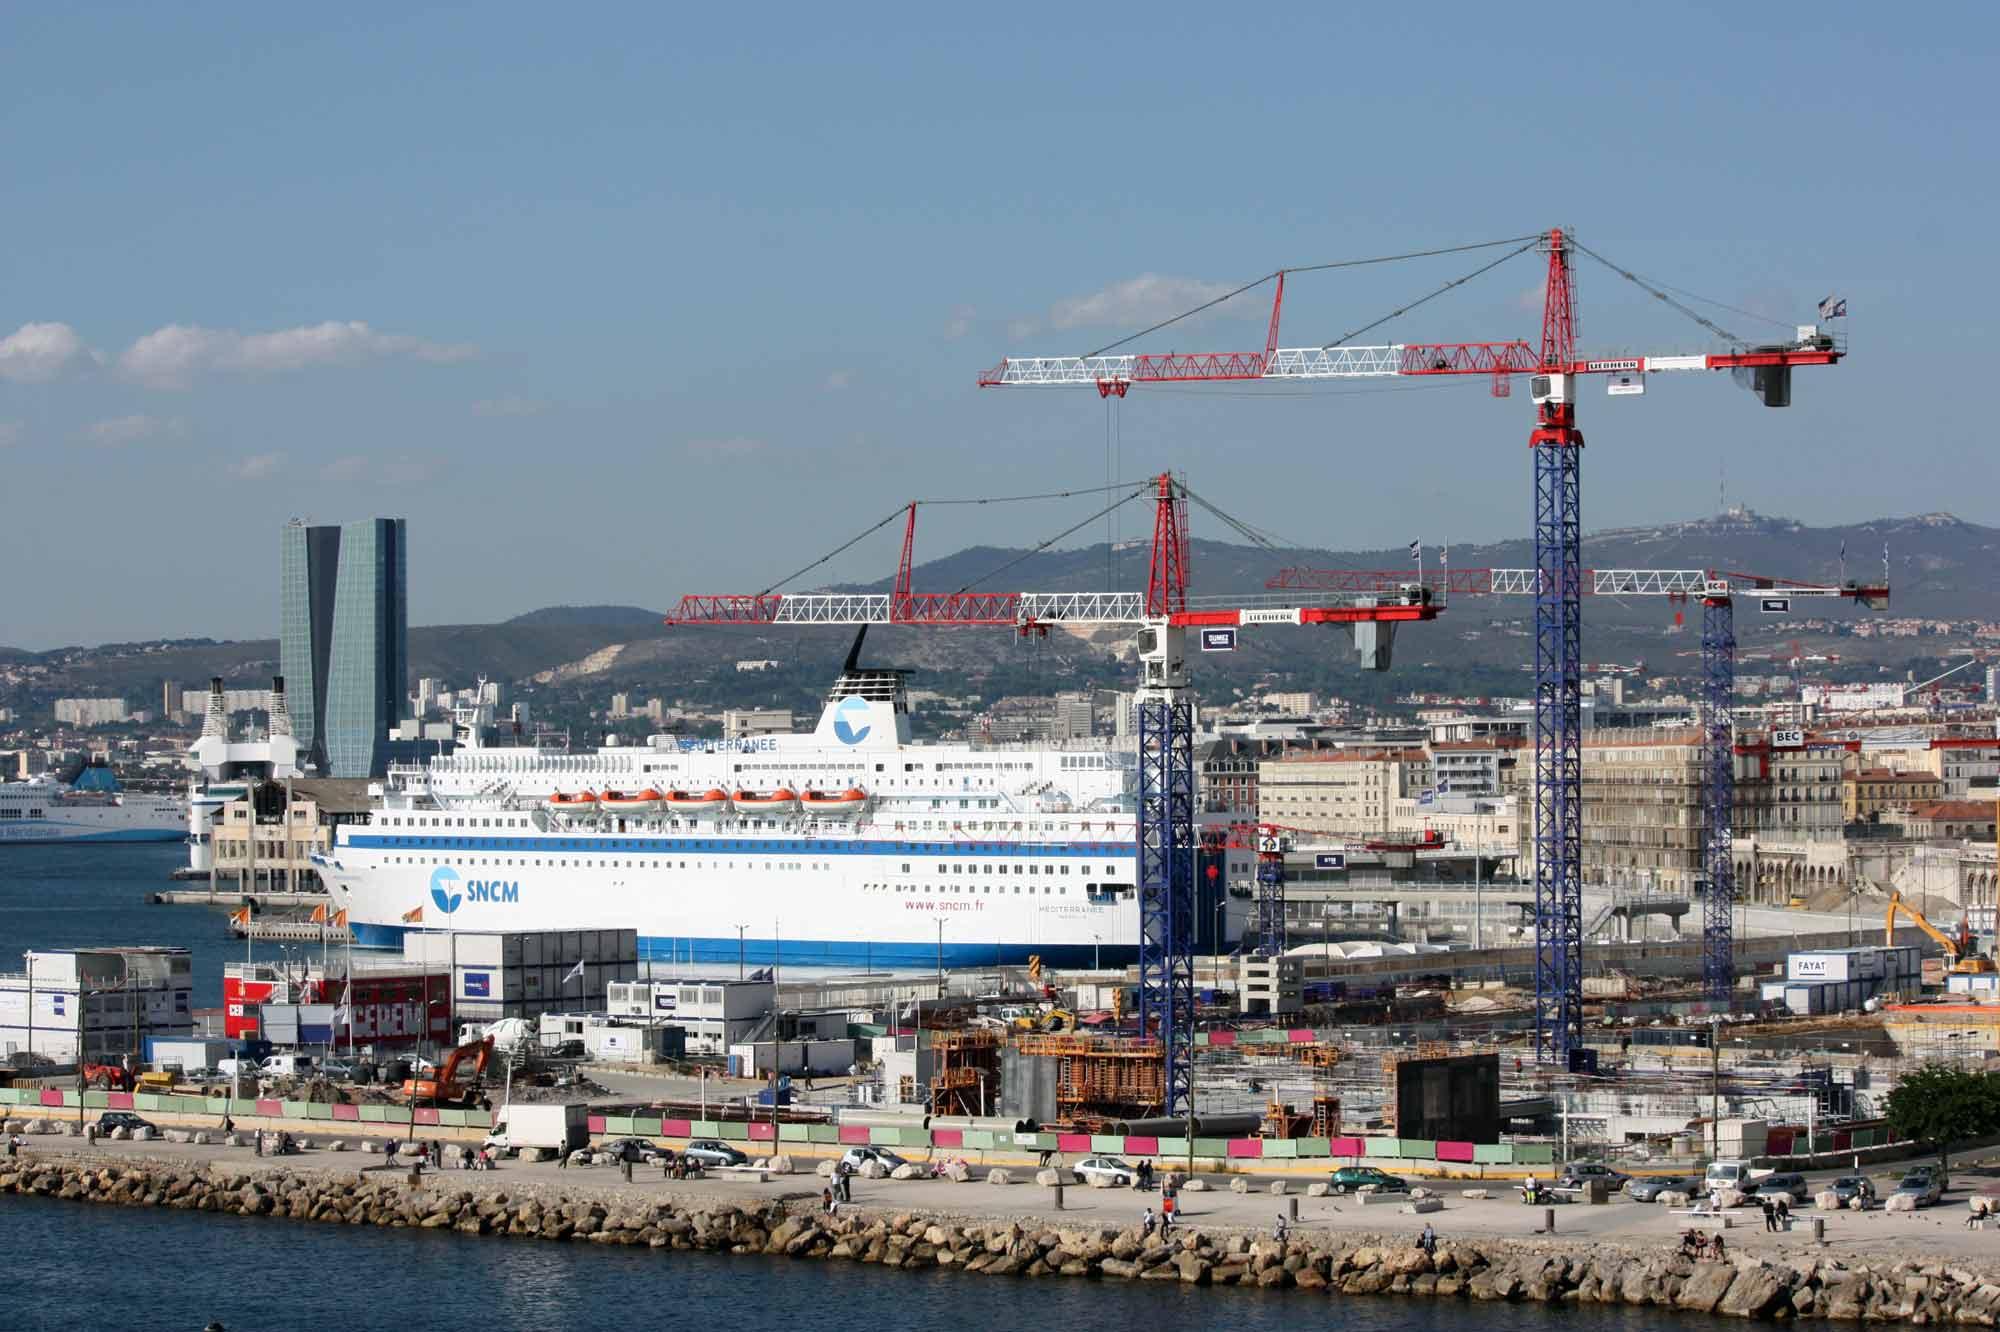 port-marseille-cimed-j4-travaux-2013-capitale-culture